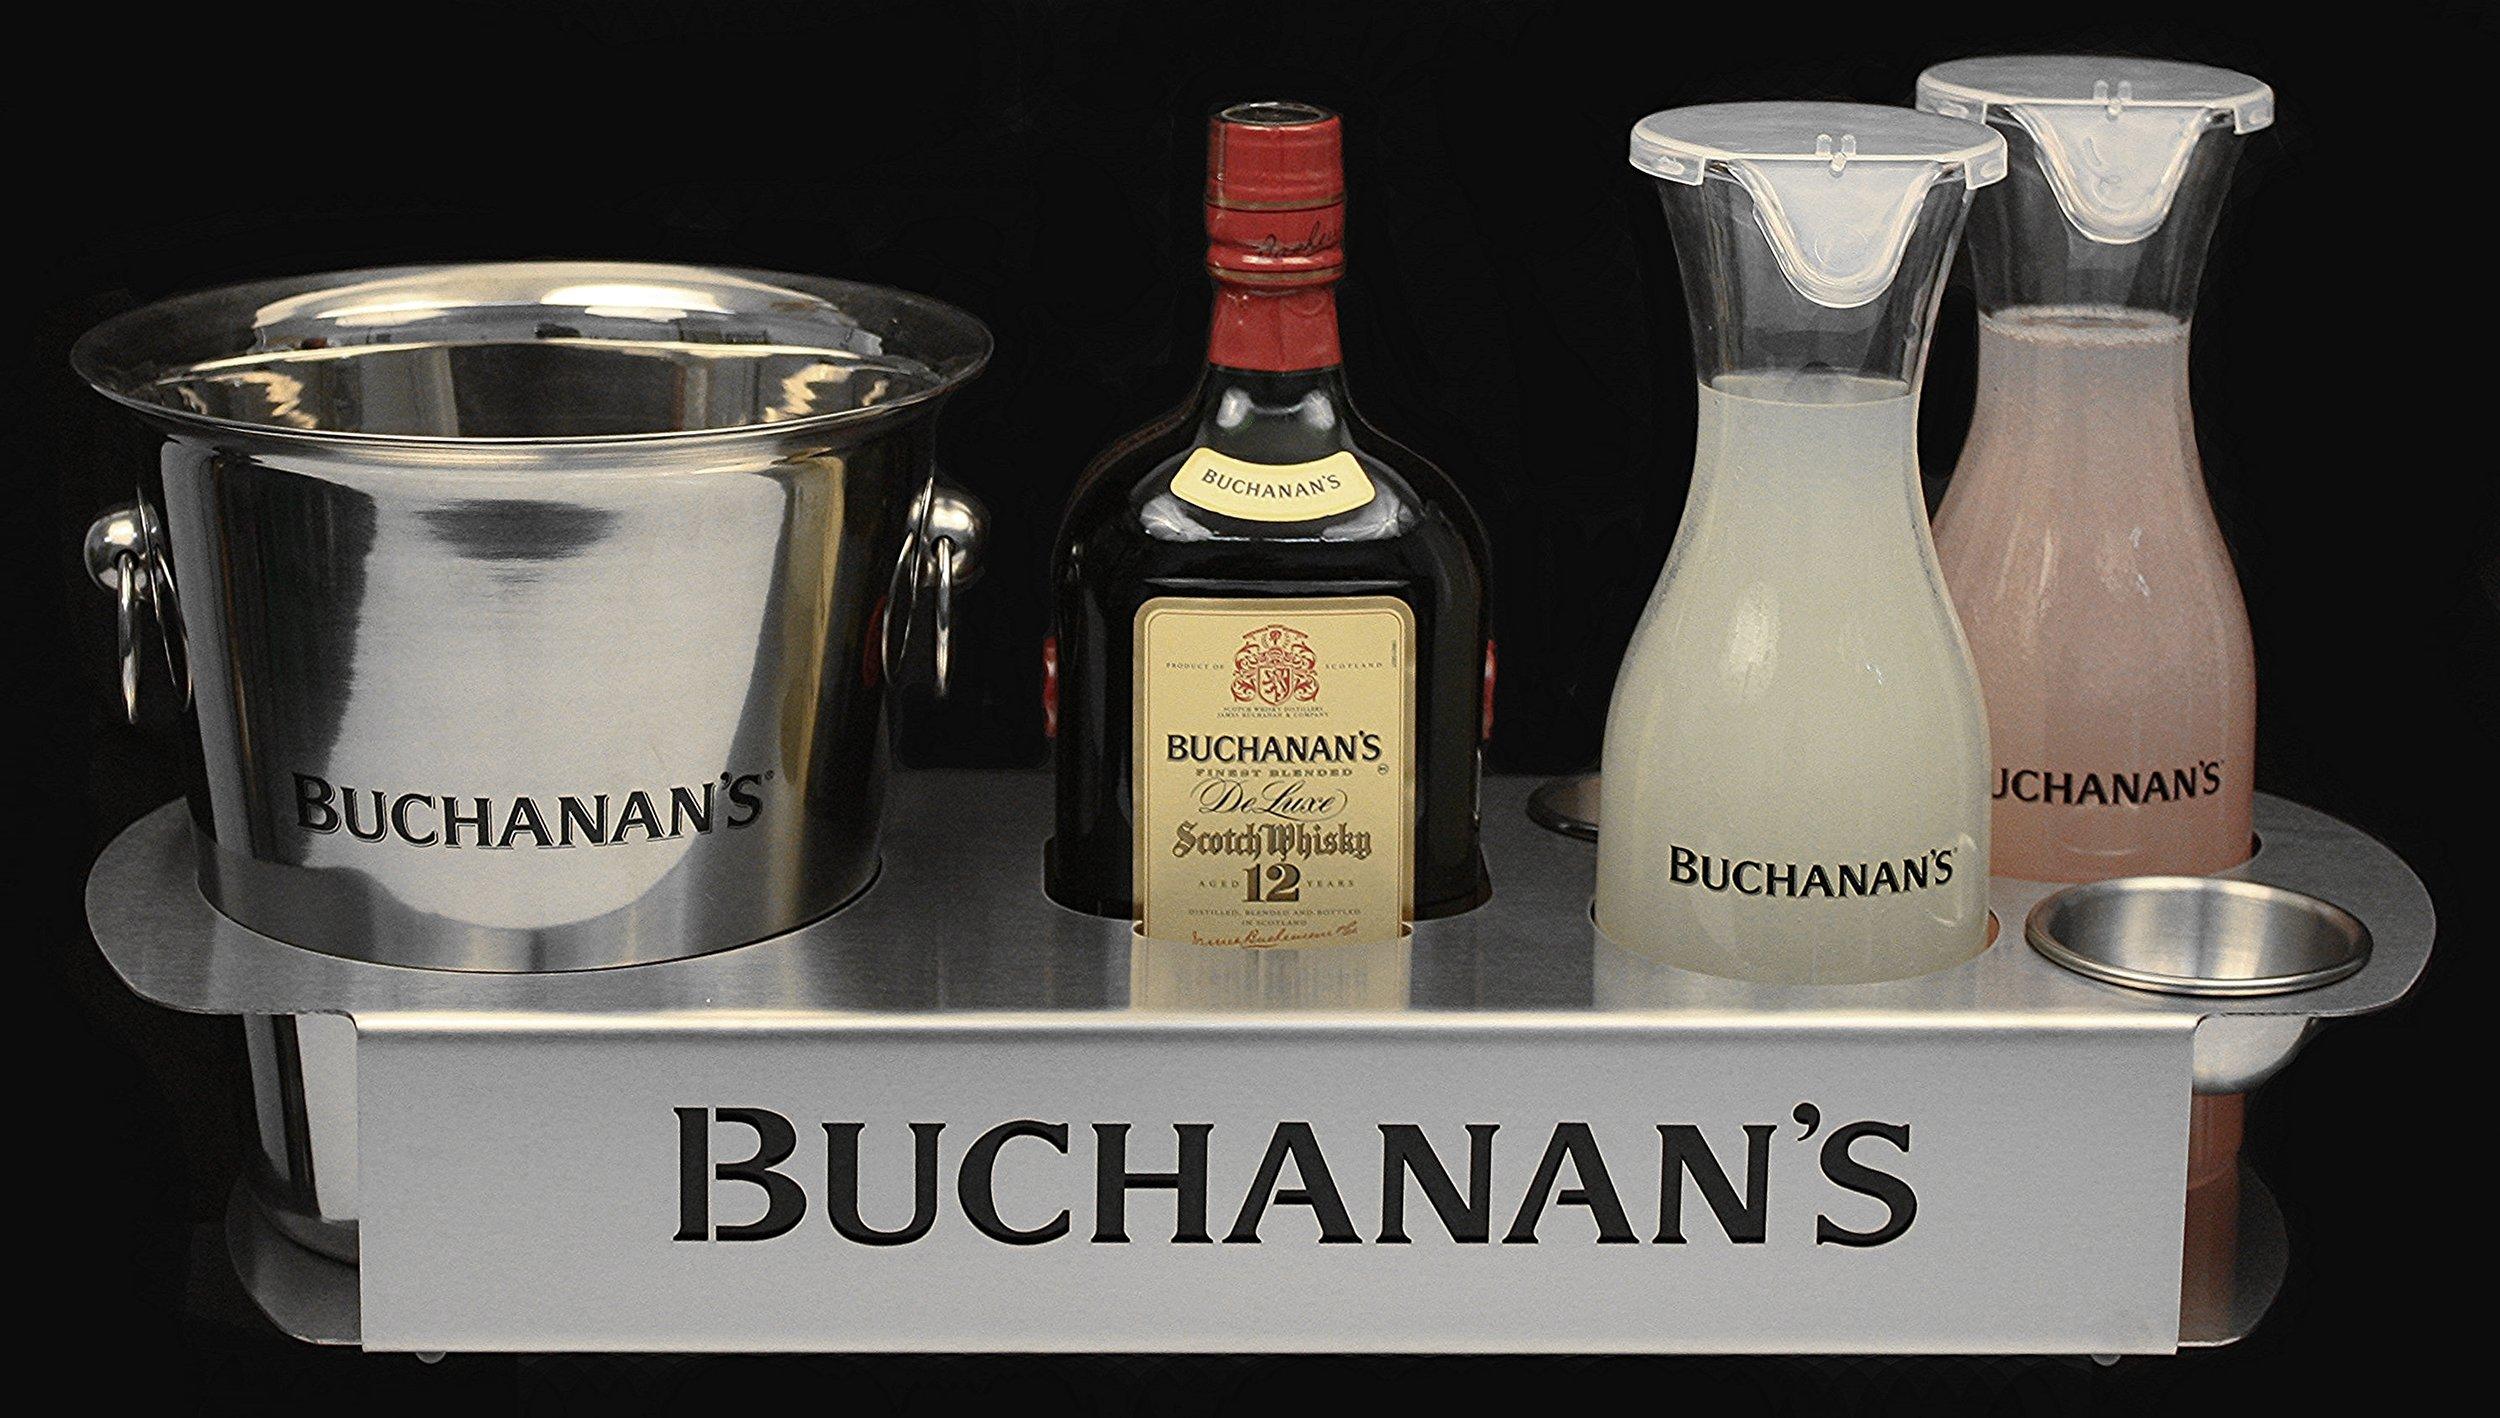 923 Buchanans.jpg